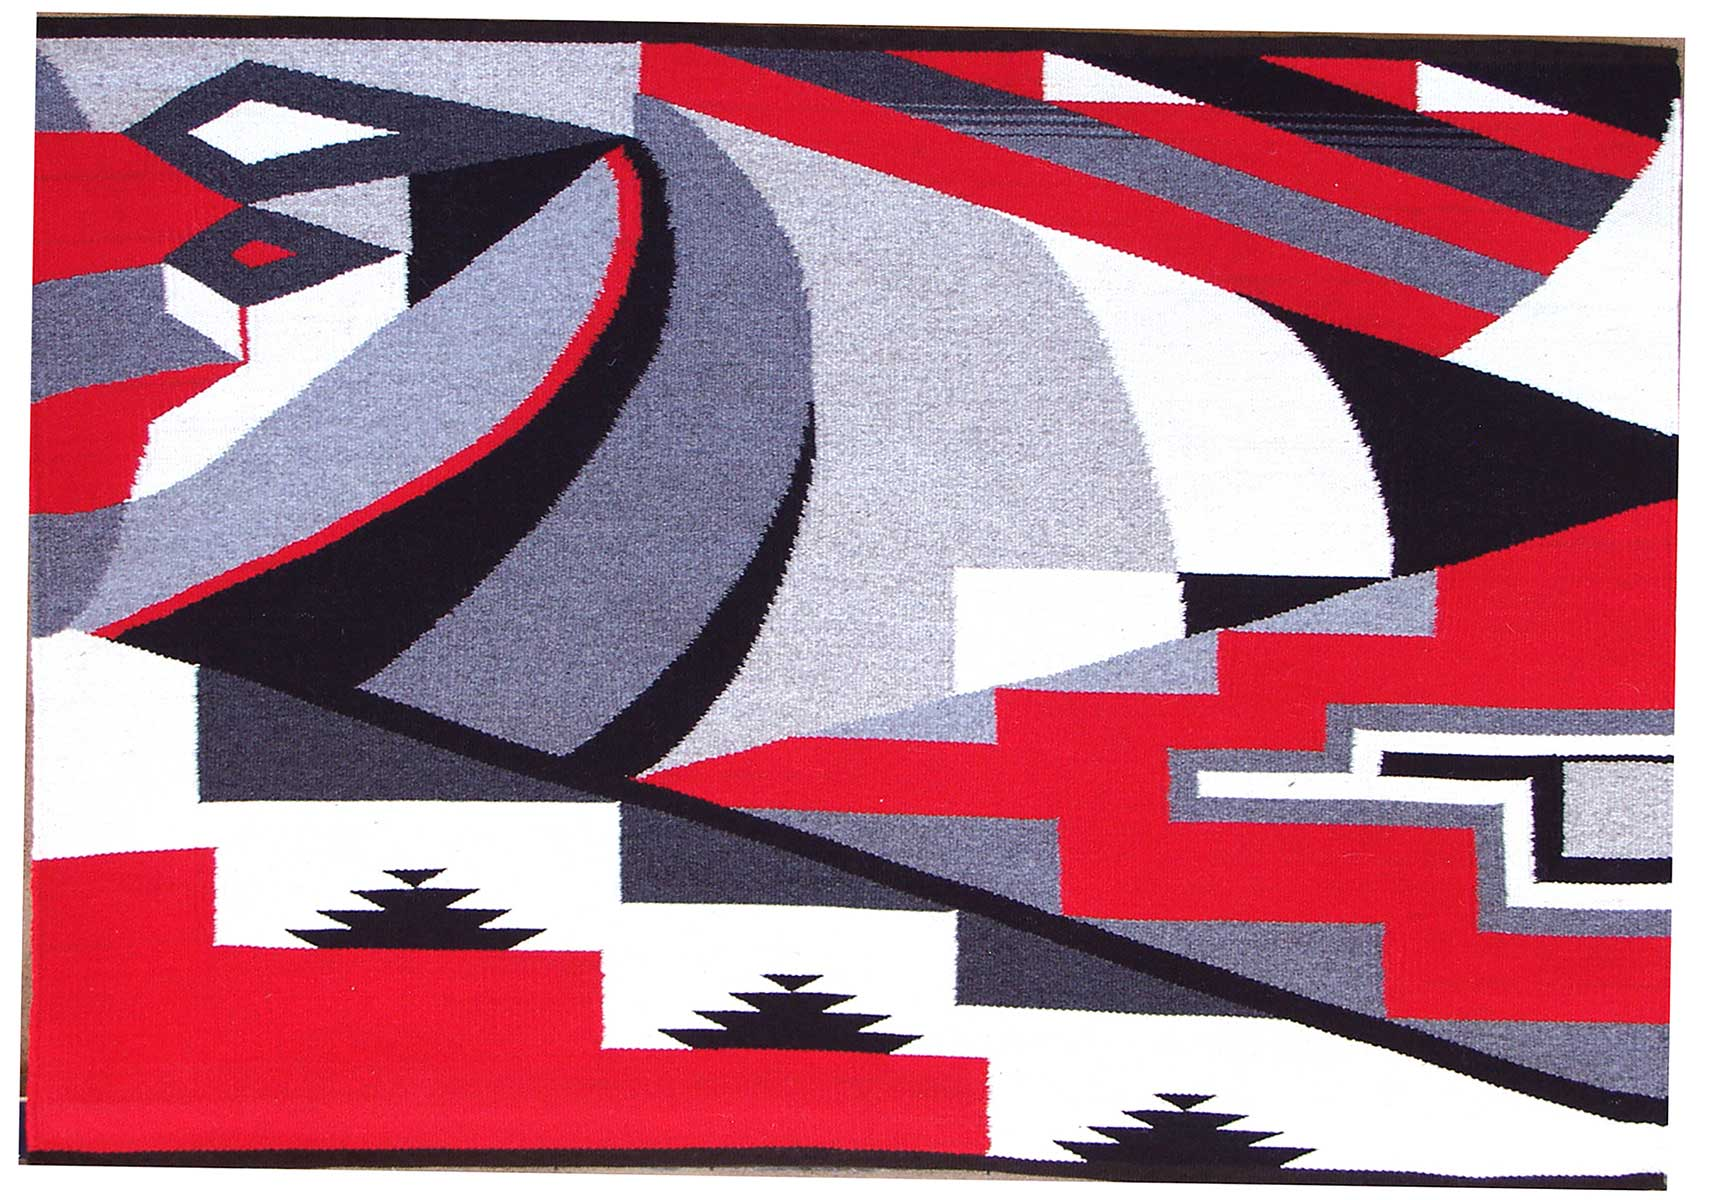 Centinela-Traditional-Arts-1.jpg